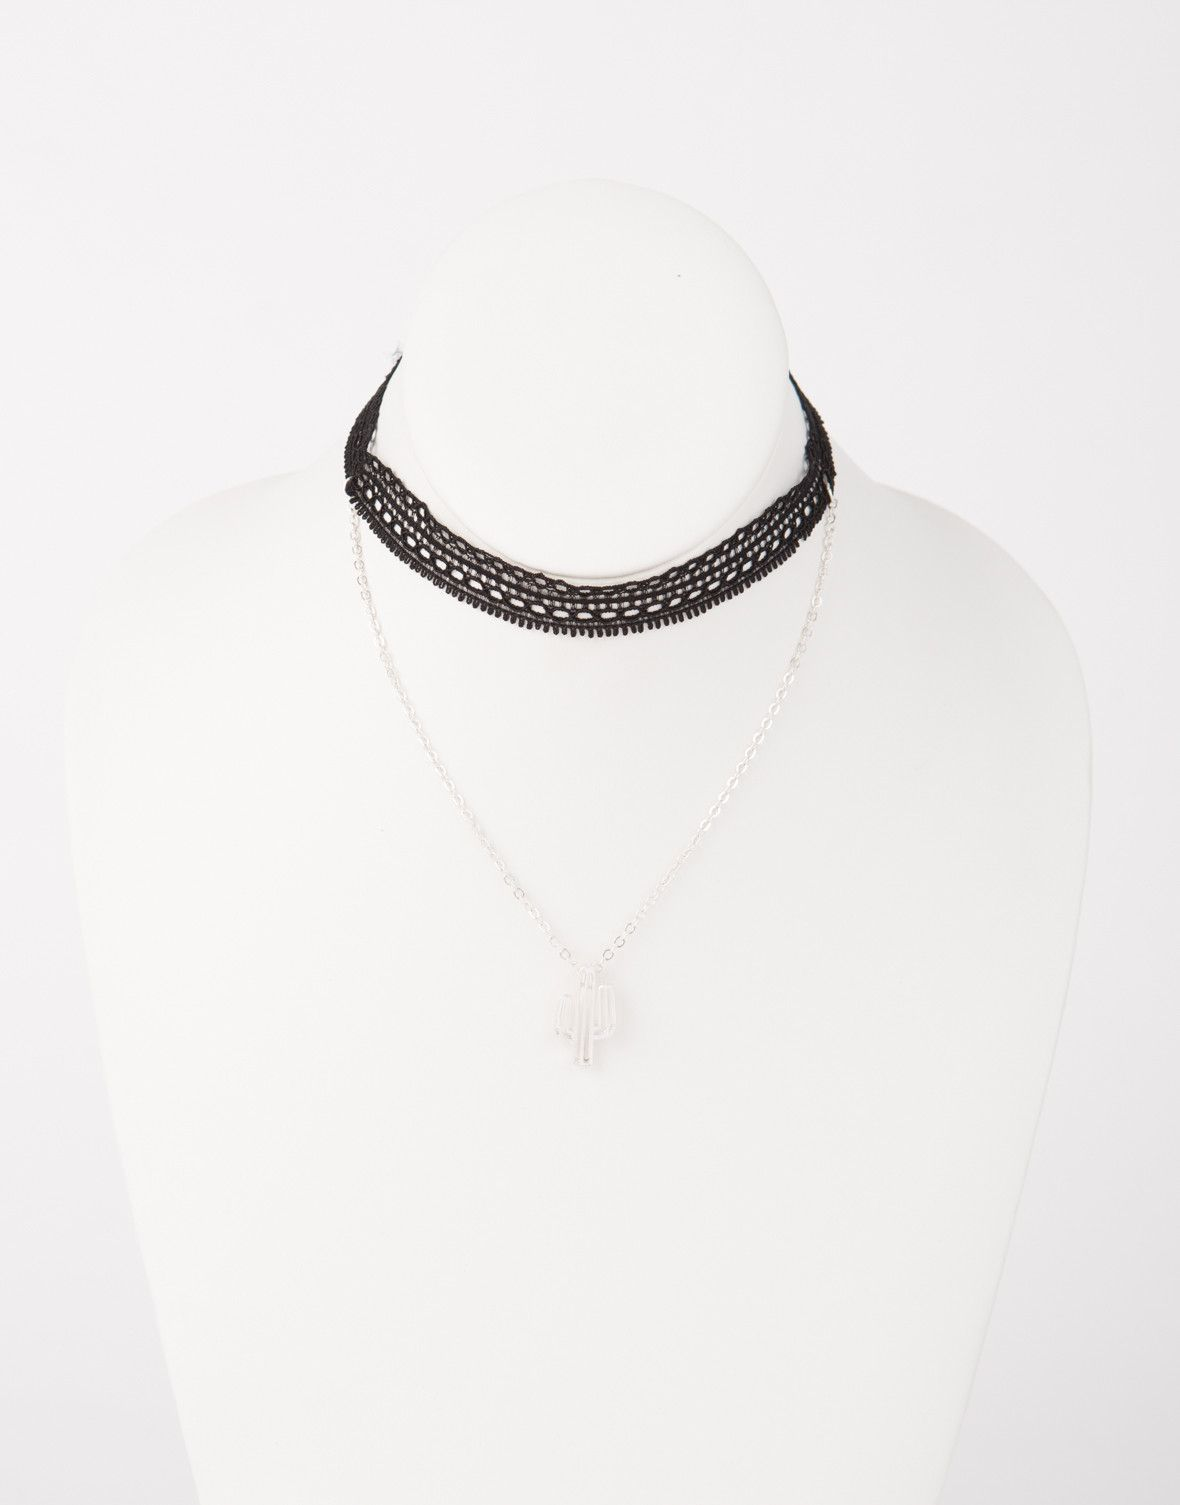 Cactus Choker Necklace